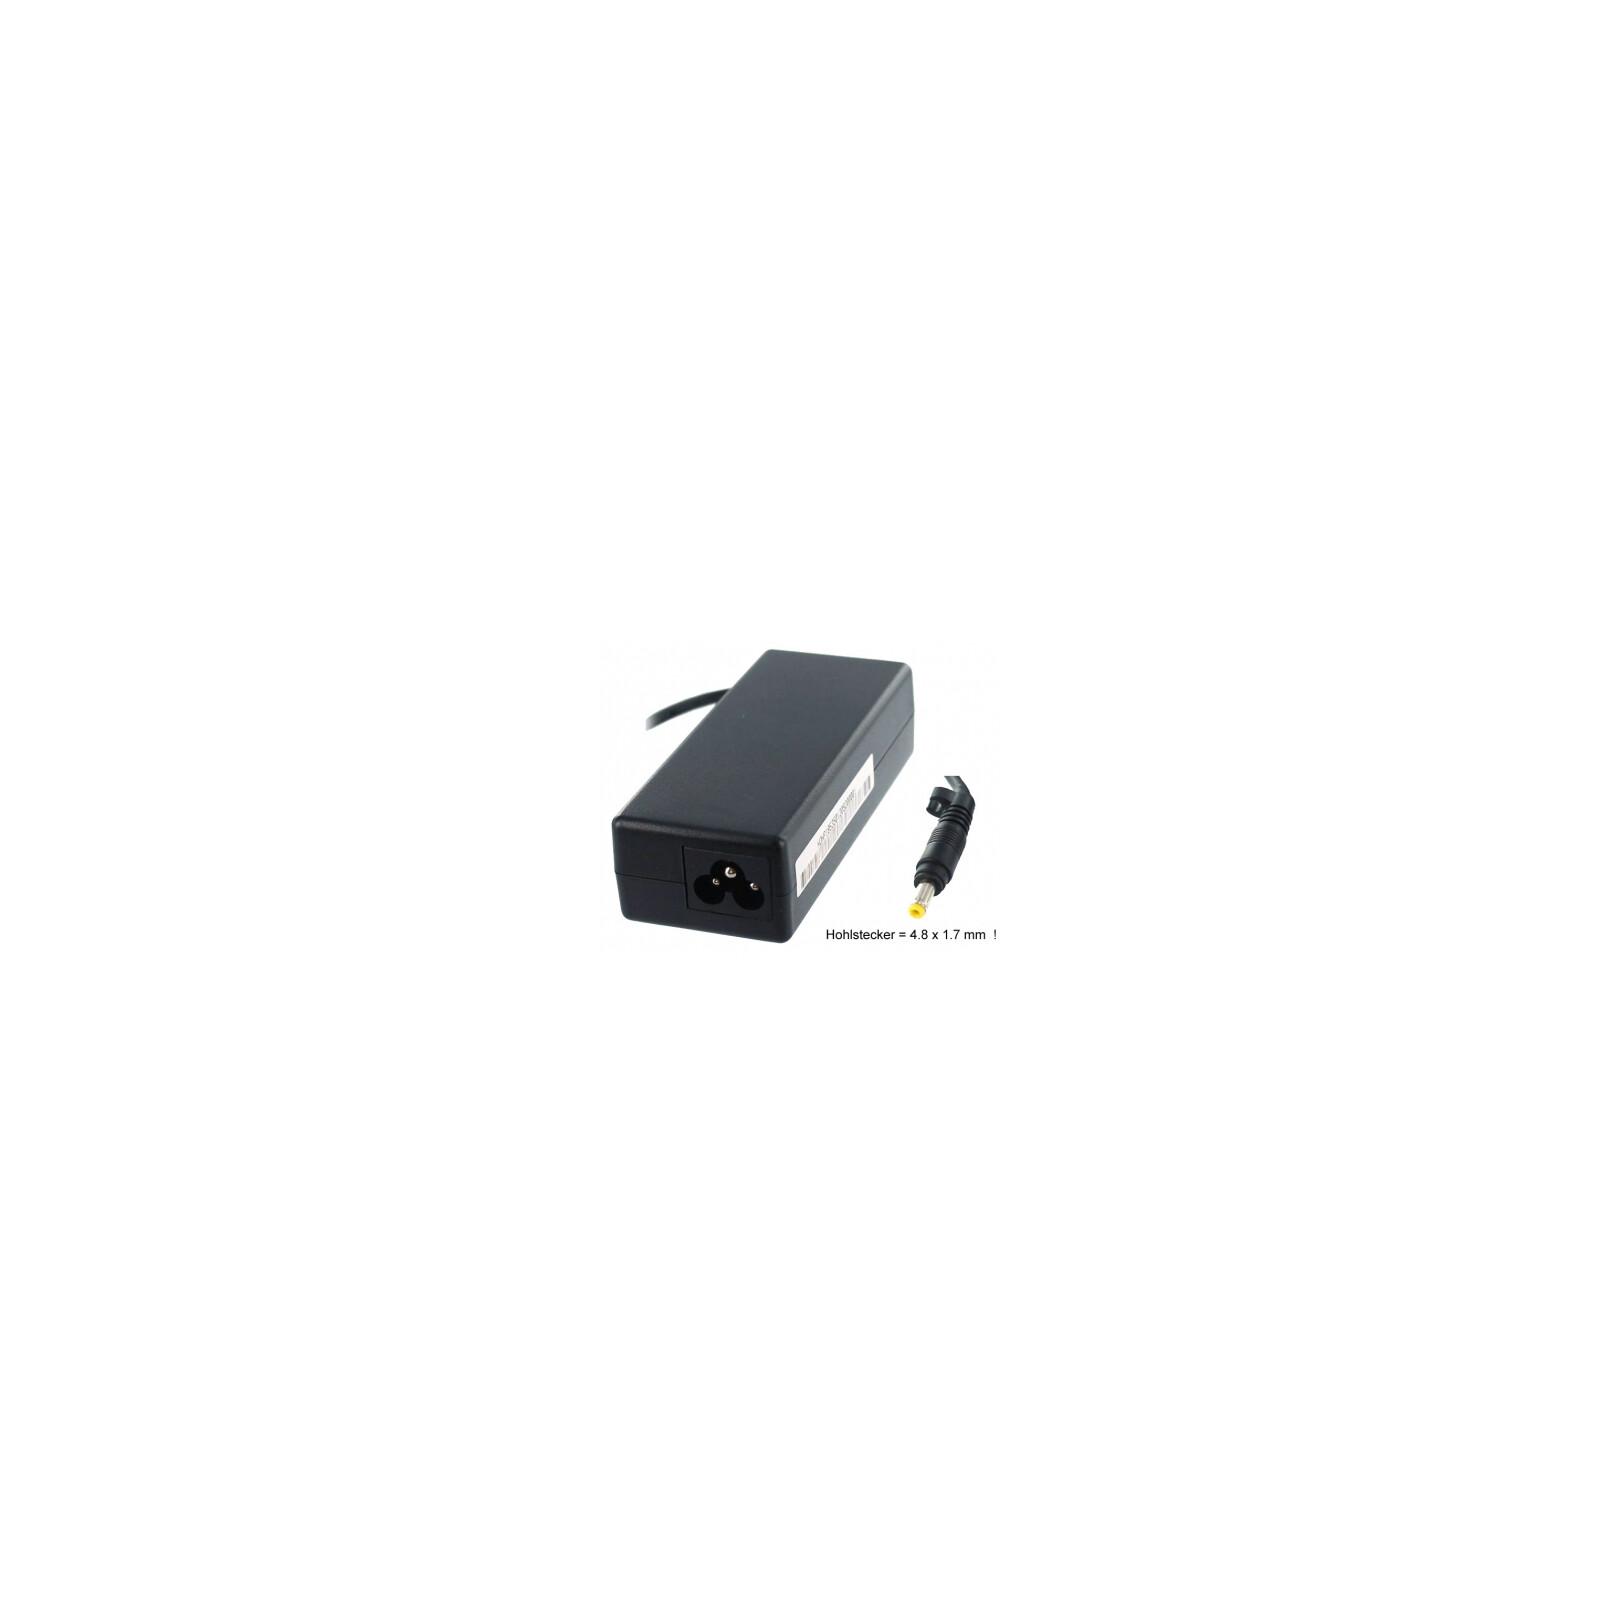 AGI Netzteil HP Compaq Presario 2800 65W